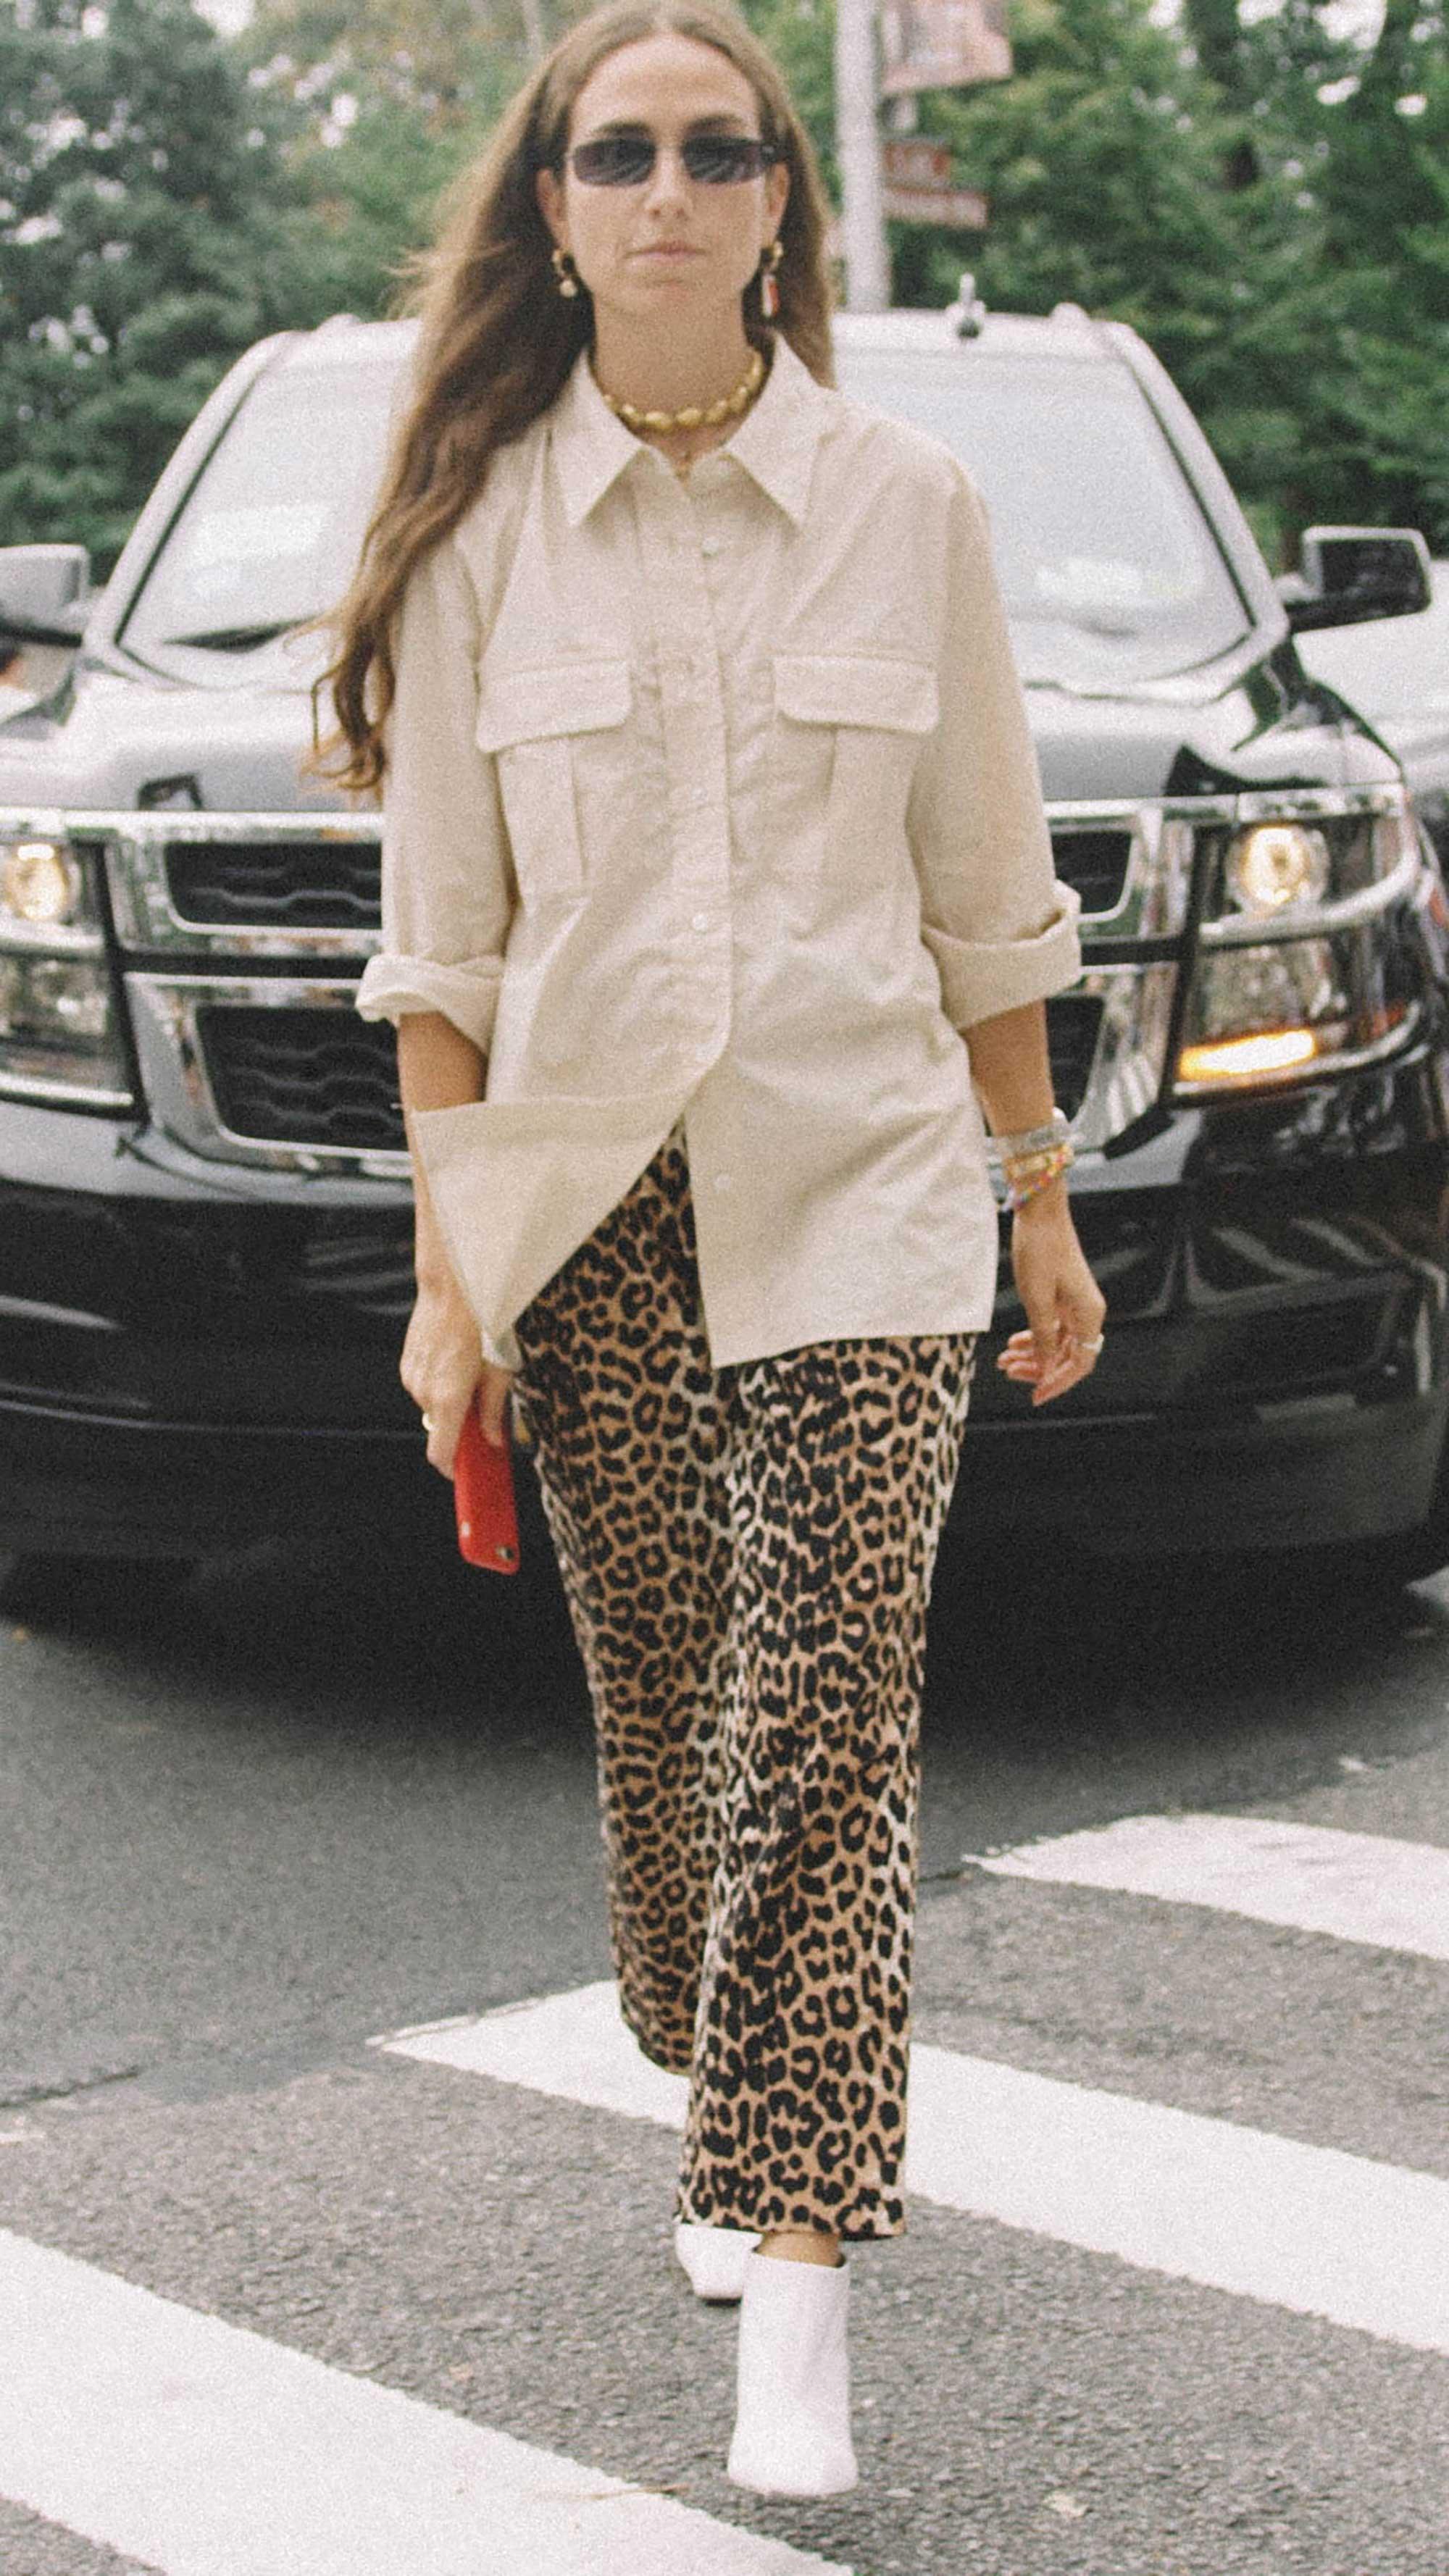 10 Easy Ways to Pull Off Animal Print, leopard pants white boots, Erika Boldrin Street Style.jpg